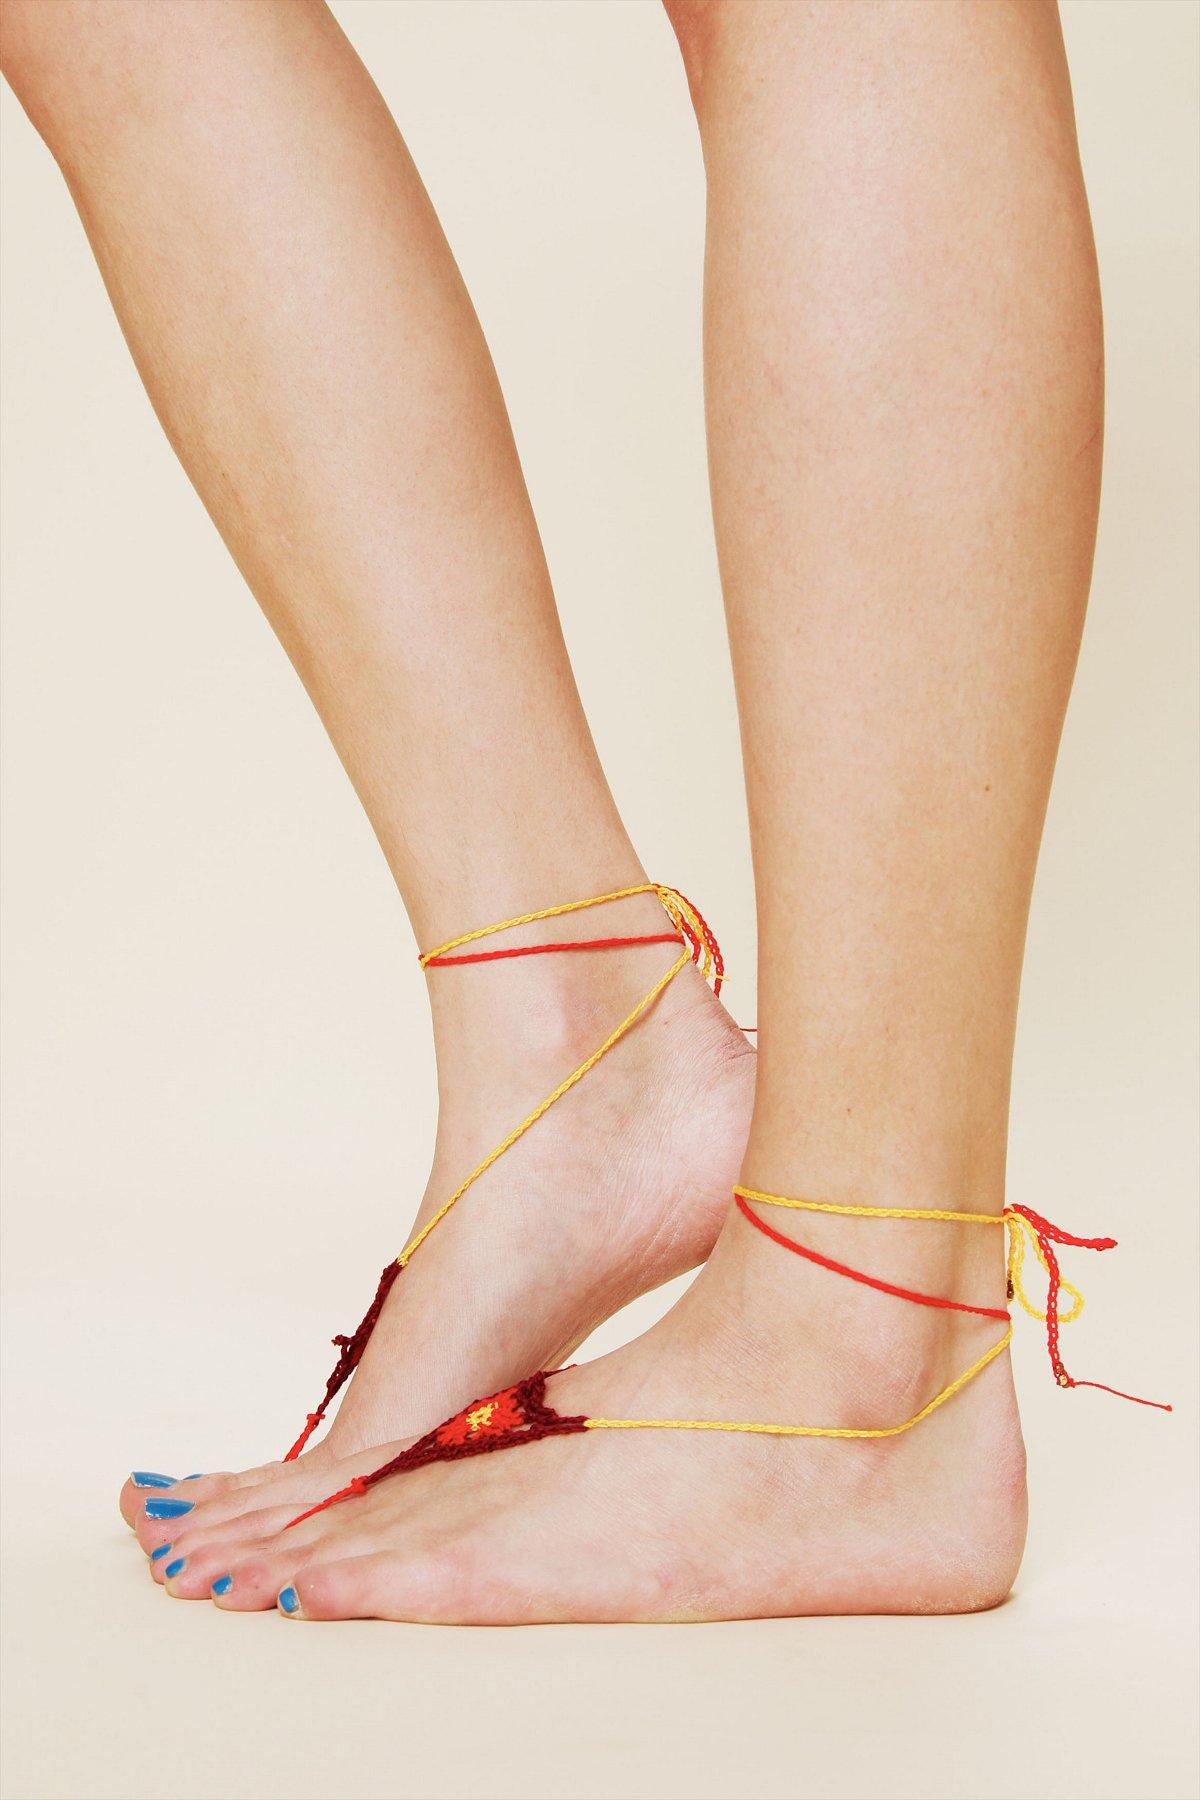 Small Barefoot Footsie